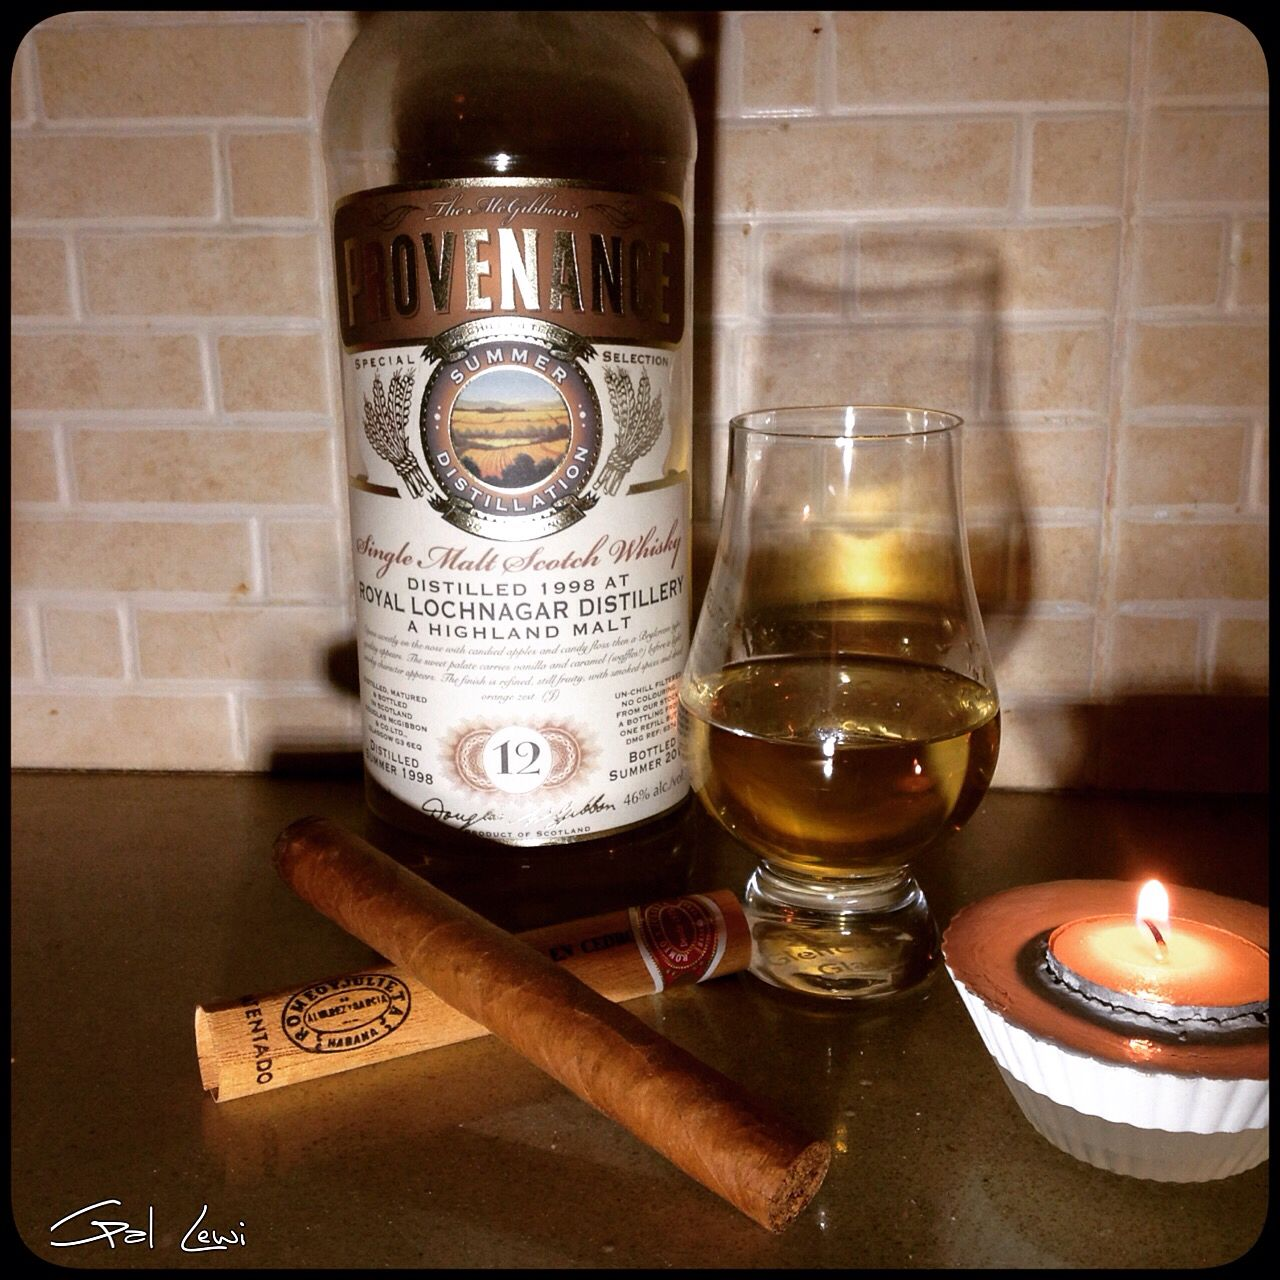 #diner with #whiskey and #cigar. Photo by #GalLewi. #romeo and julite #royallochnagar #glencairn #stilllife #vanitas